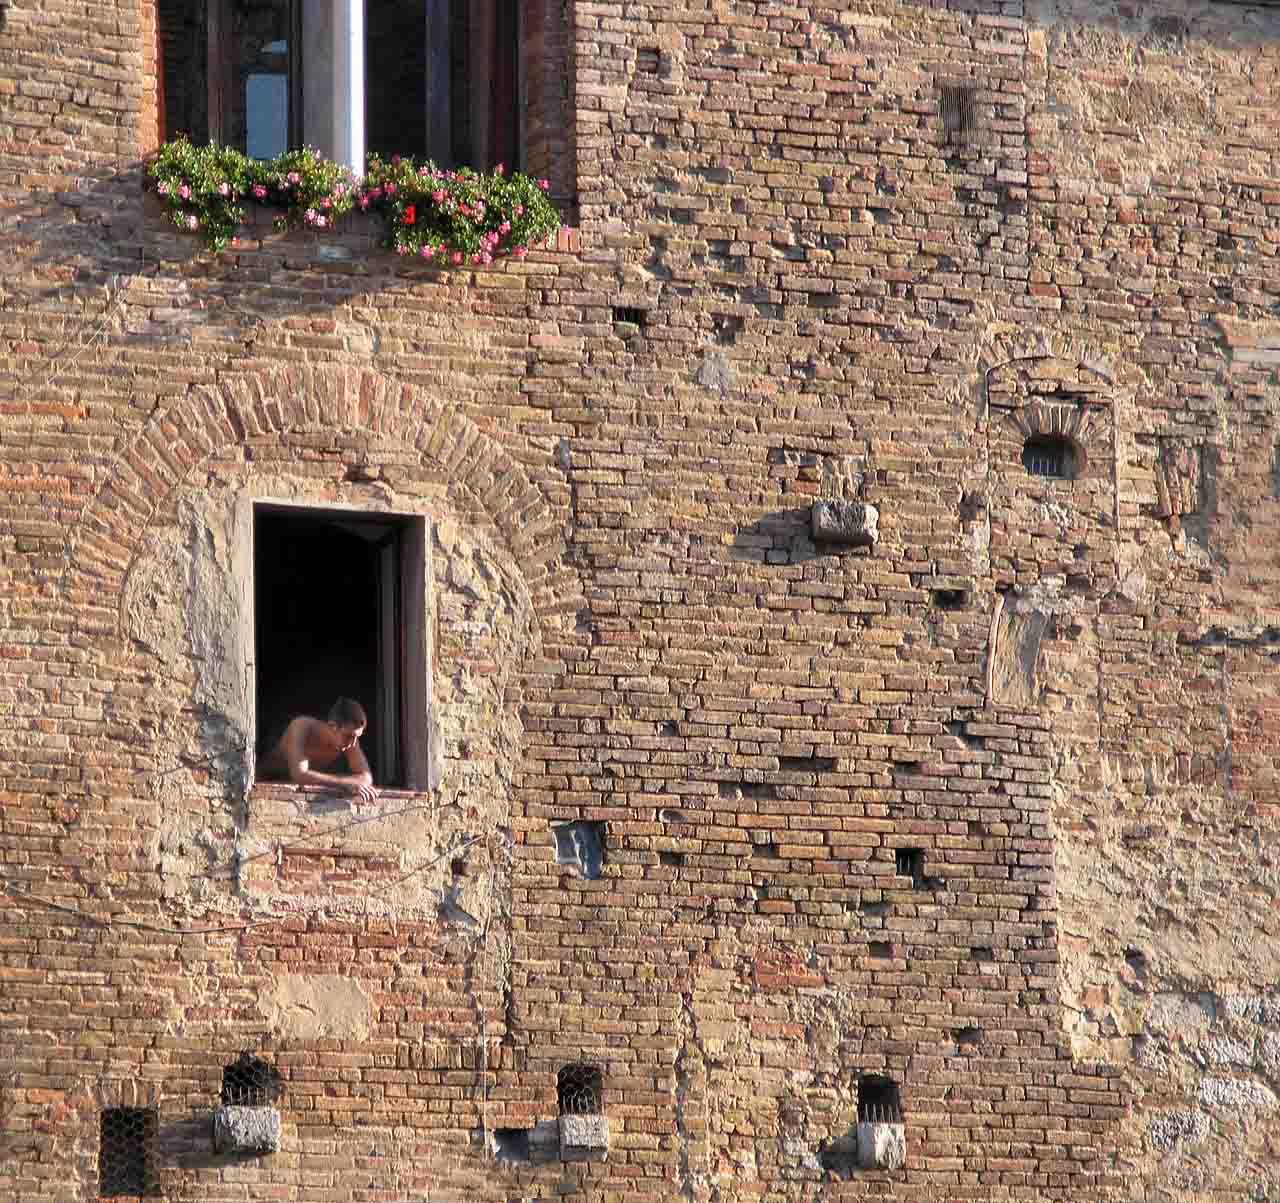 My image from Tuscany - Jan Messersmith